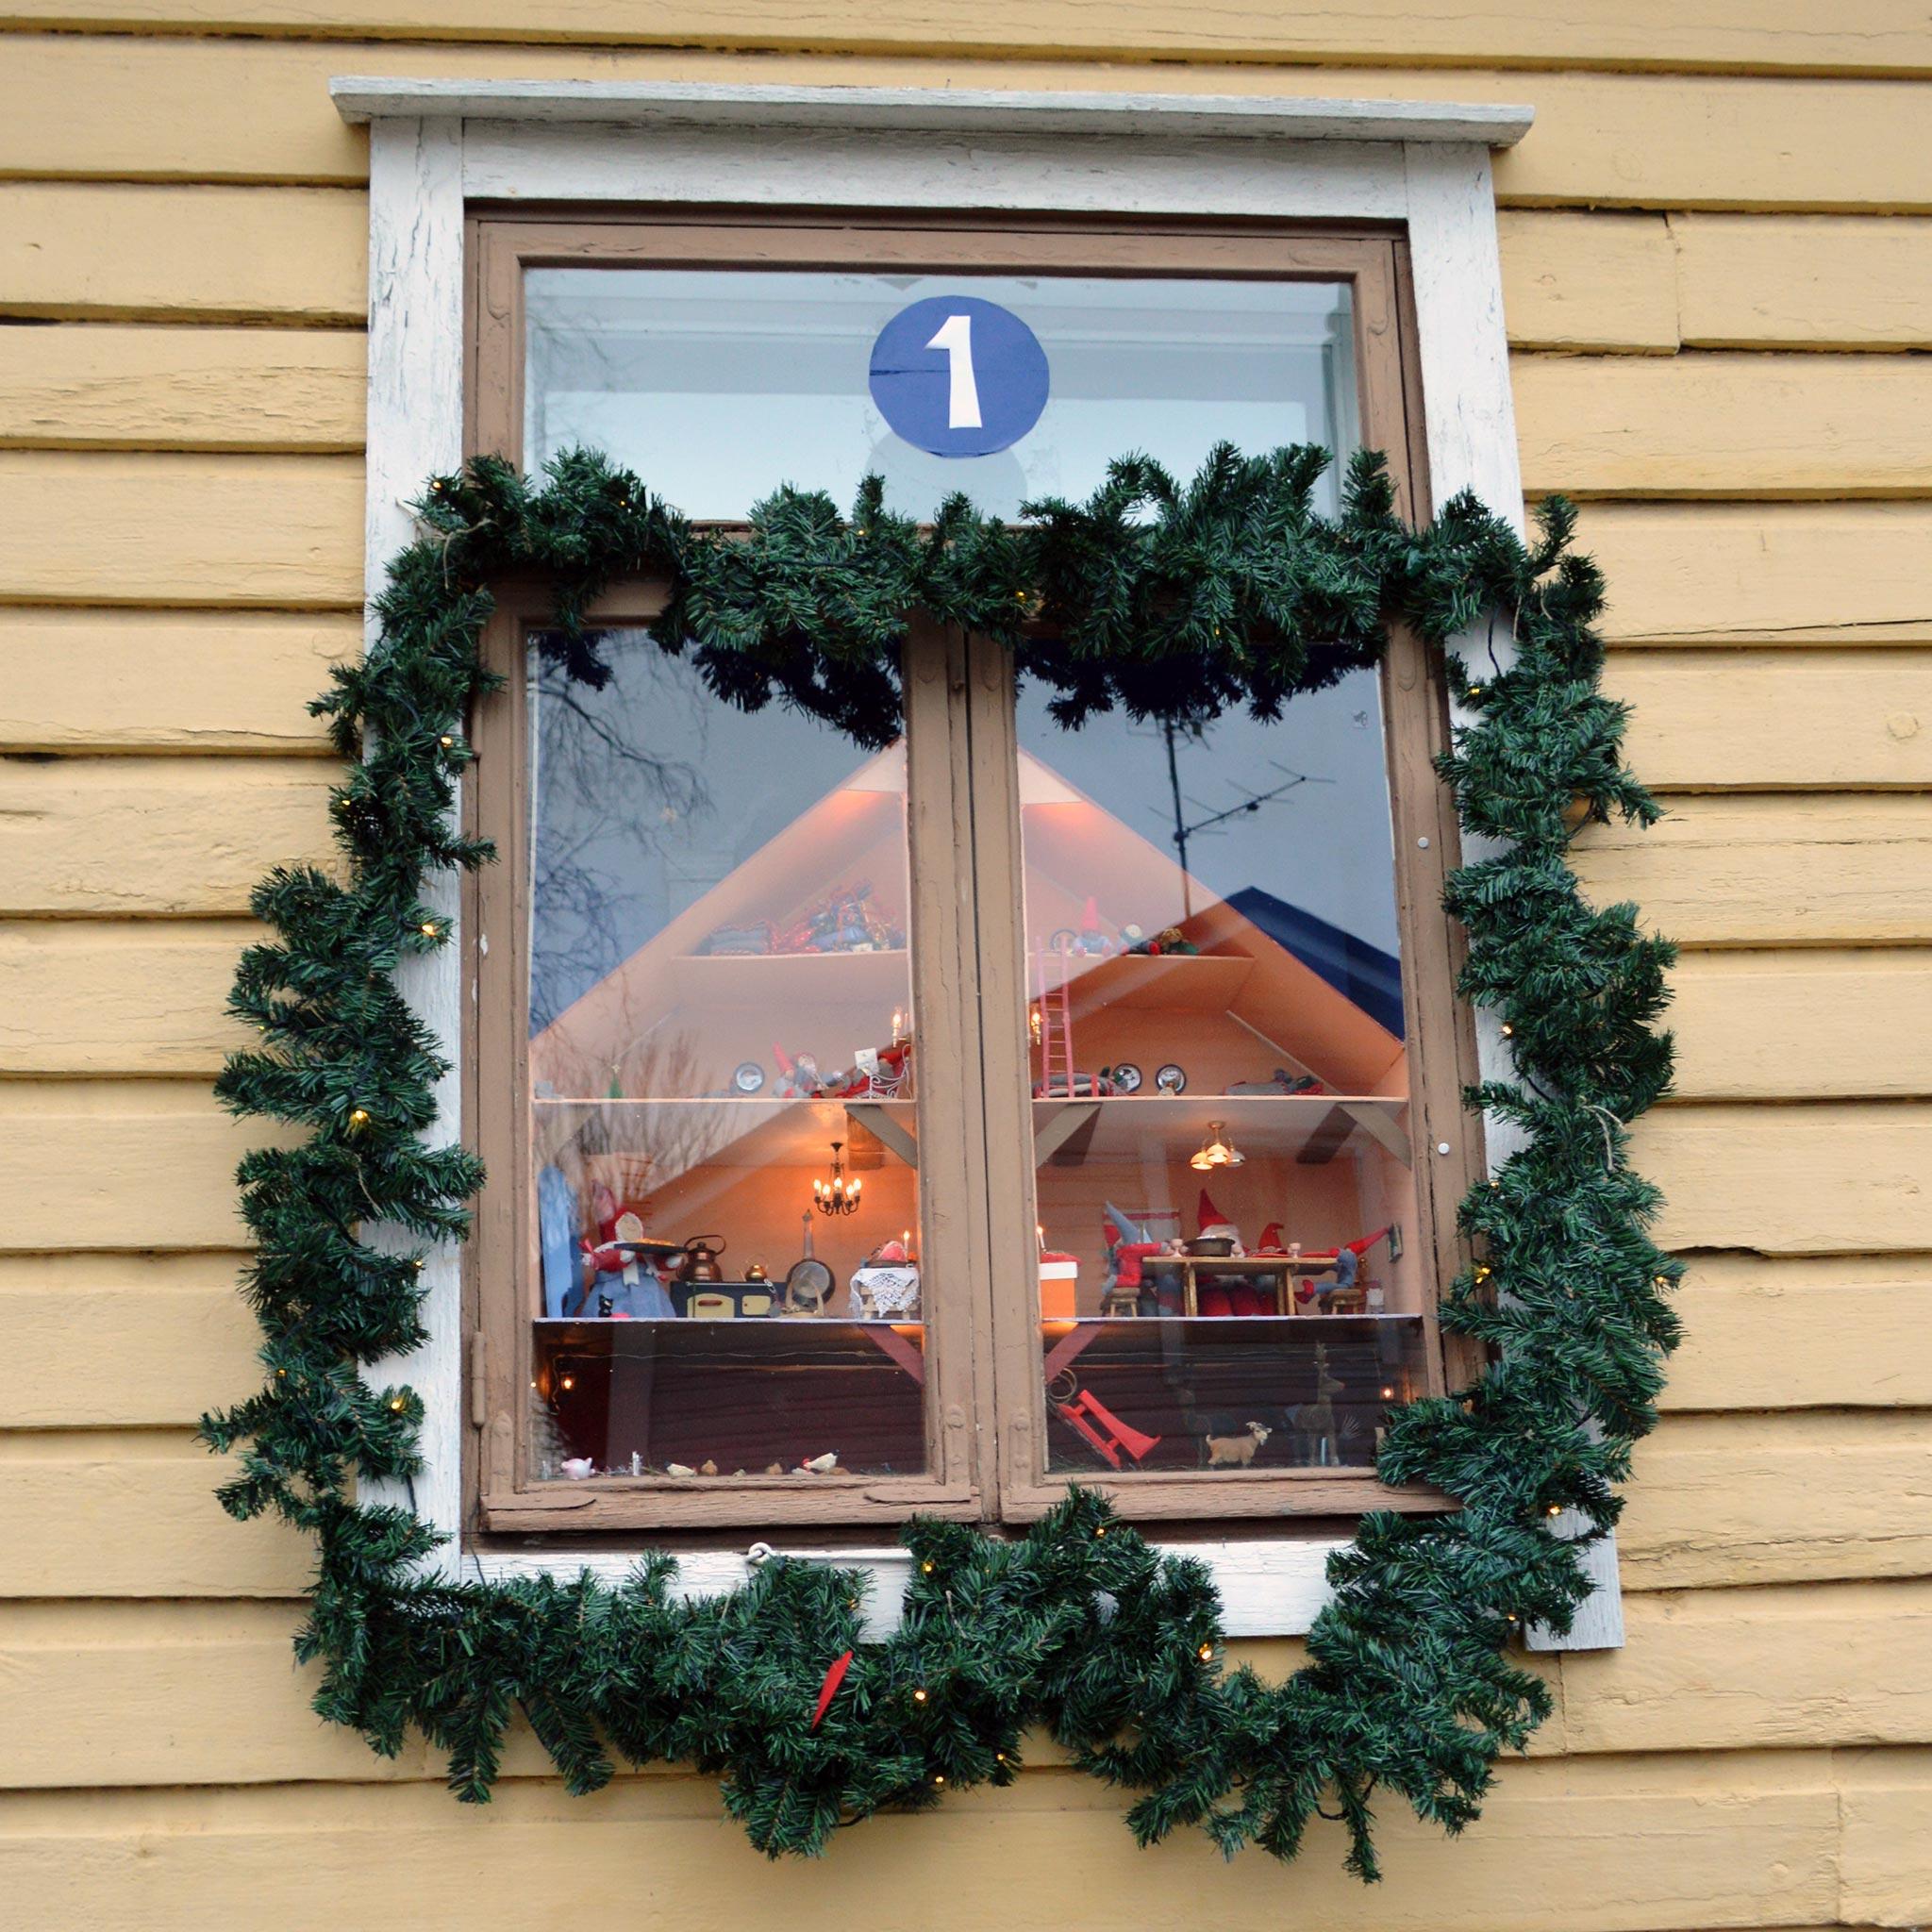 Joulukalenteri-ikkuna © Elisa Helenius